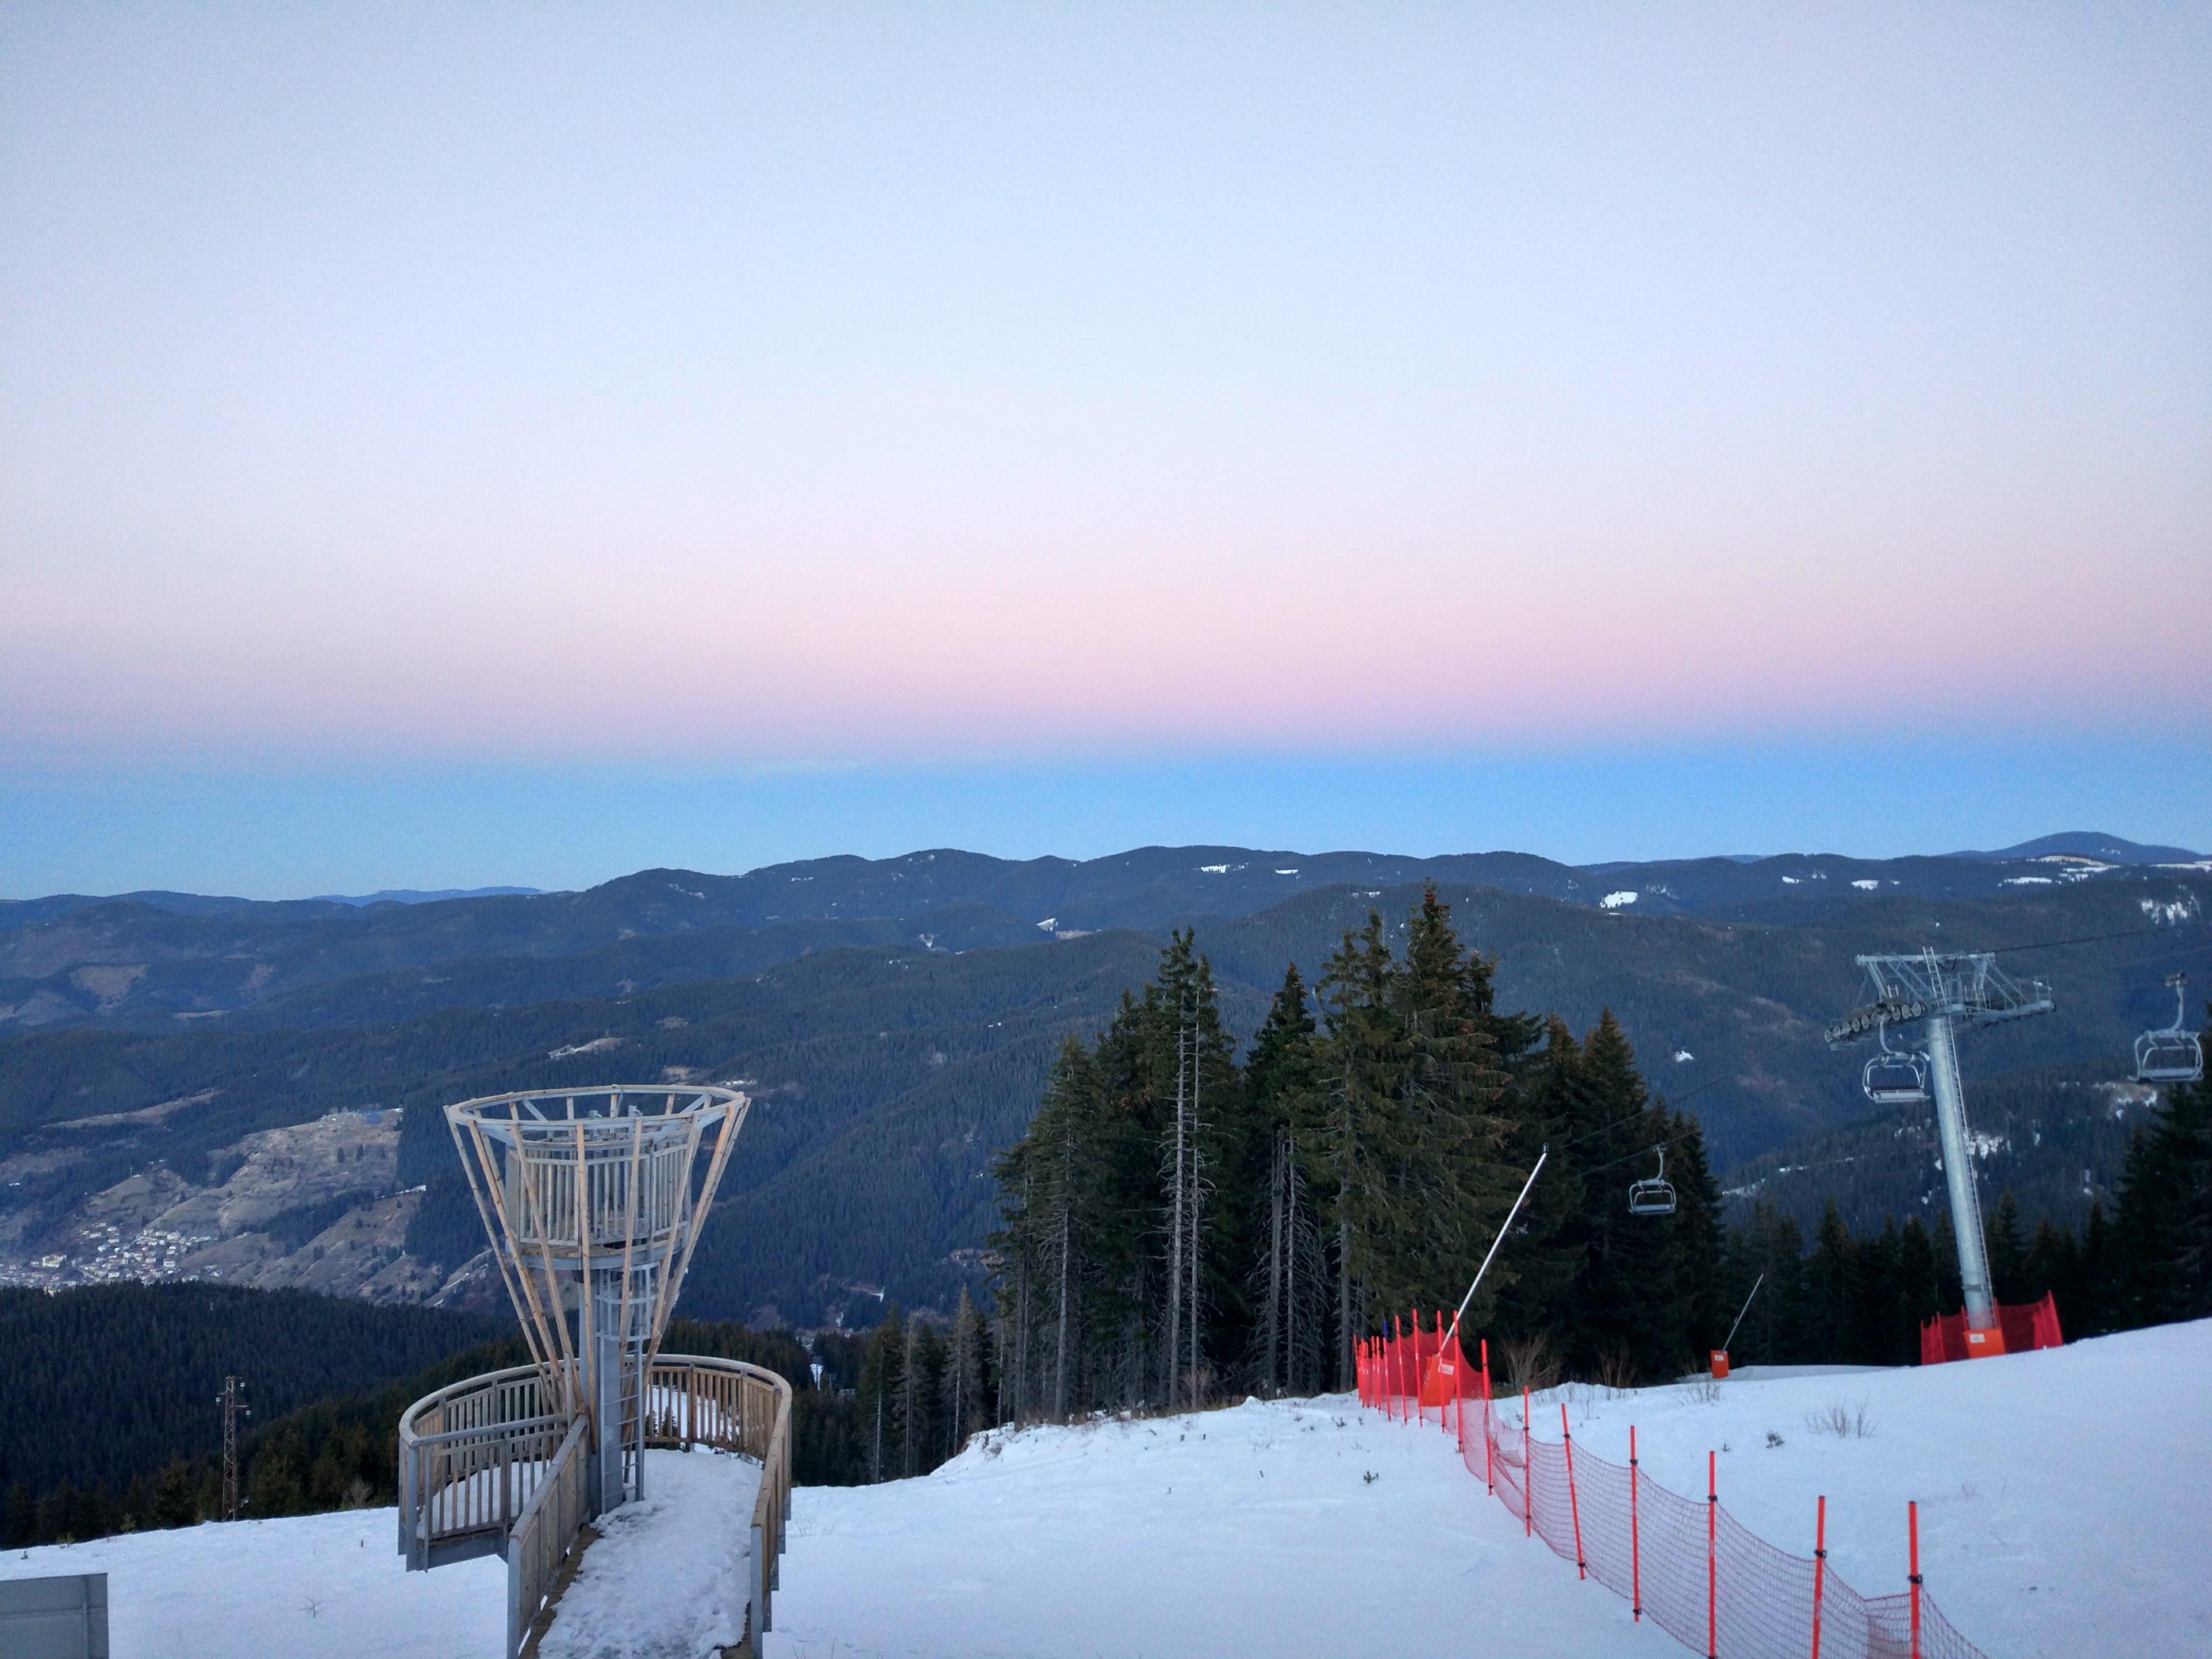 #mechichal #rodopi #ski #skiing #slope #winter #time #amazing #nature #beautiful #Bulgaria #Rodopi #mountain #skislope